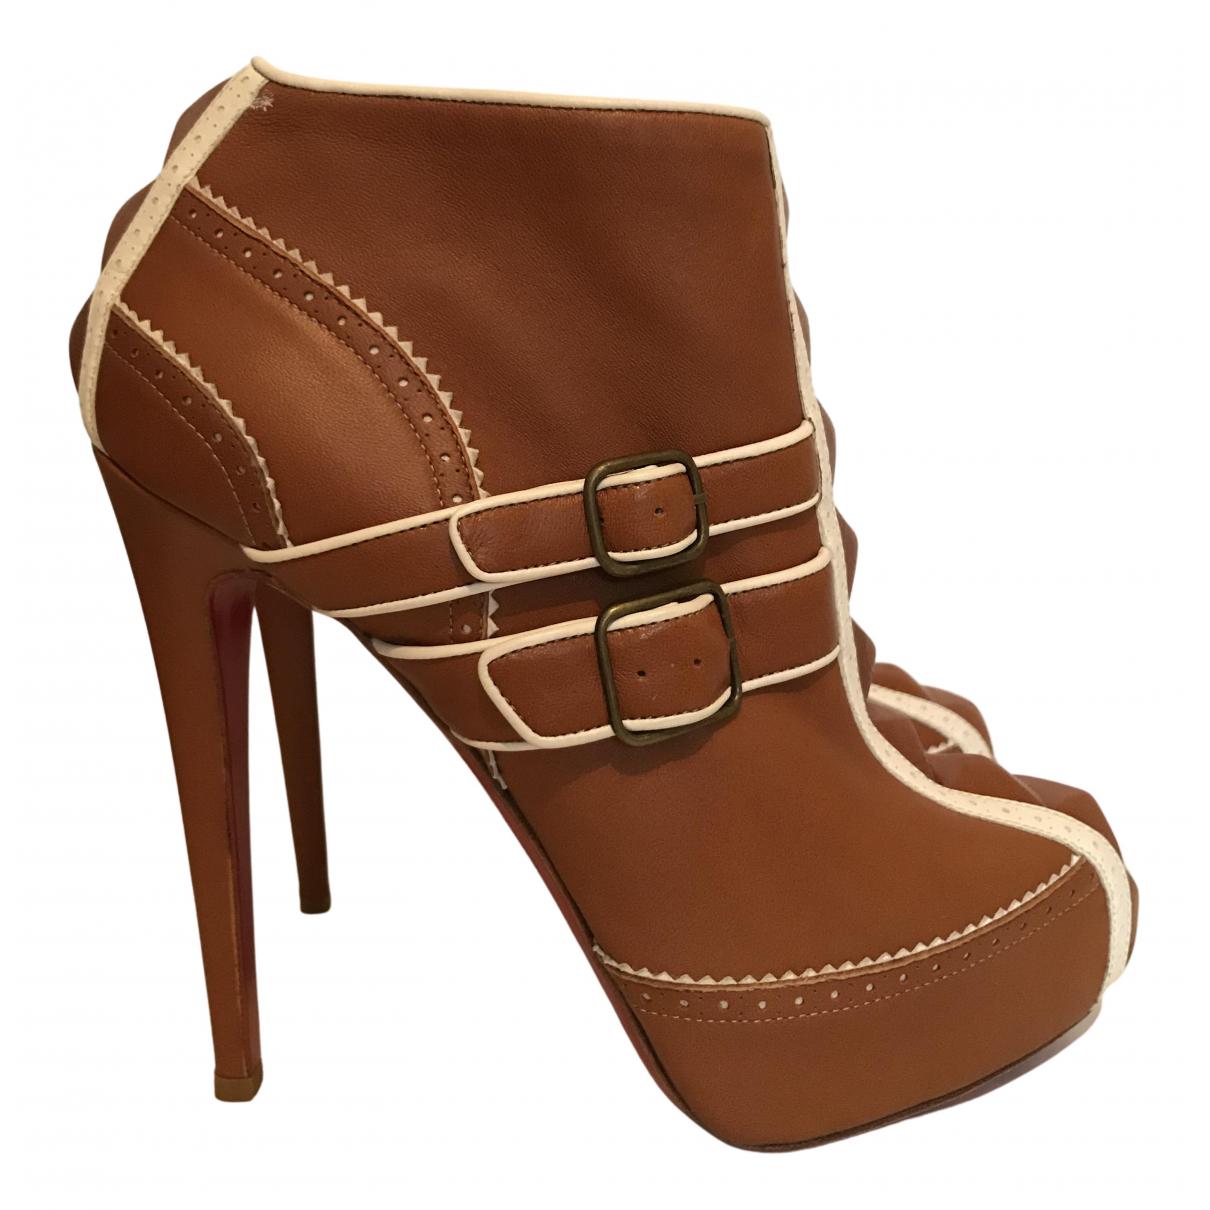 Christian Louboutin N Camel Leather Boots for Women 38 EU